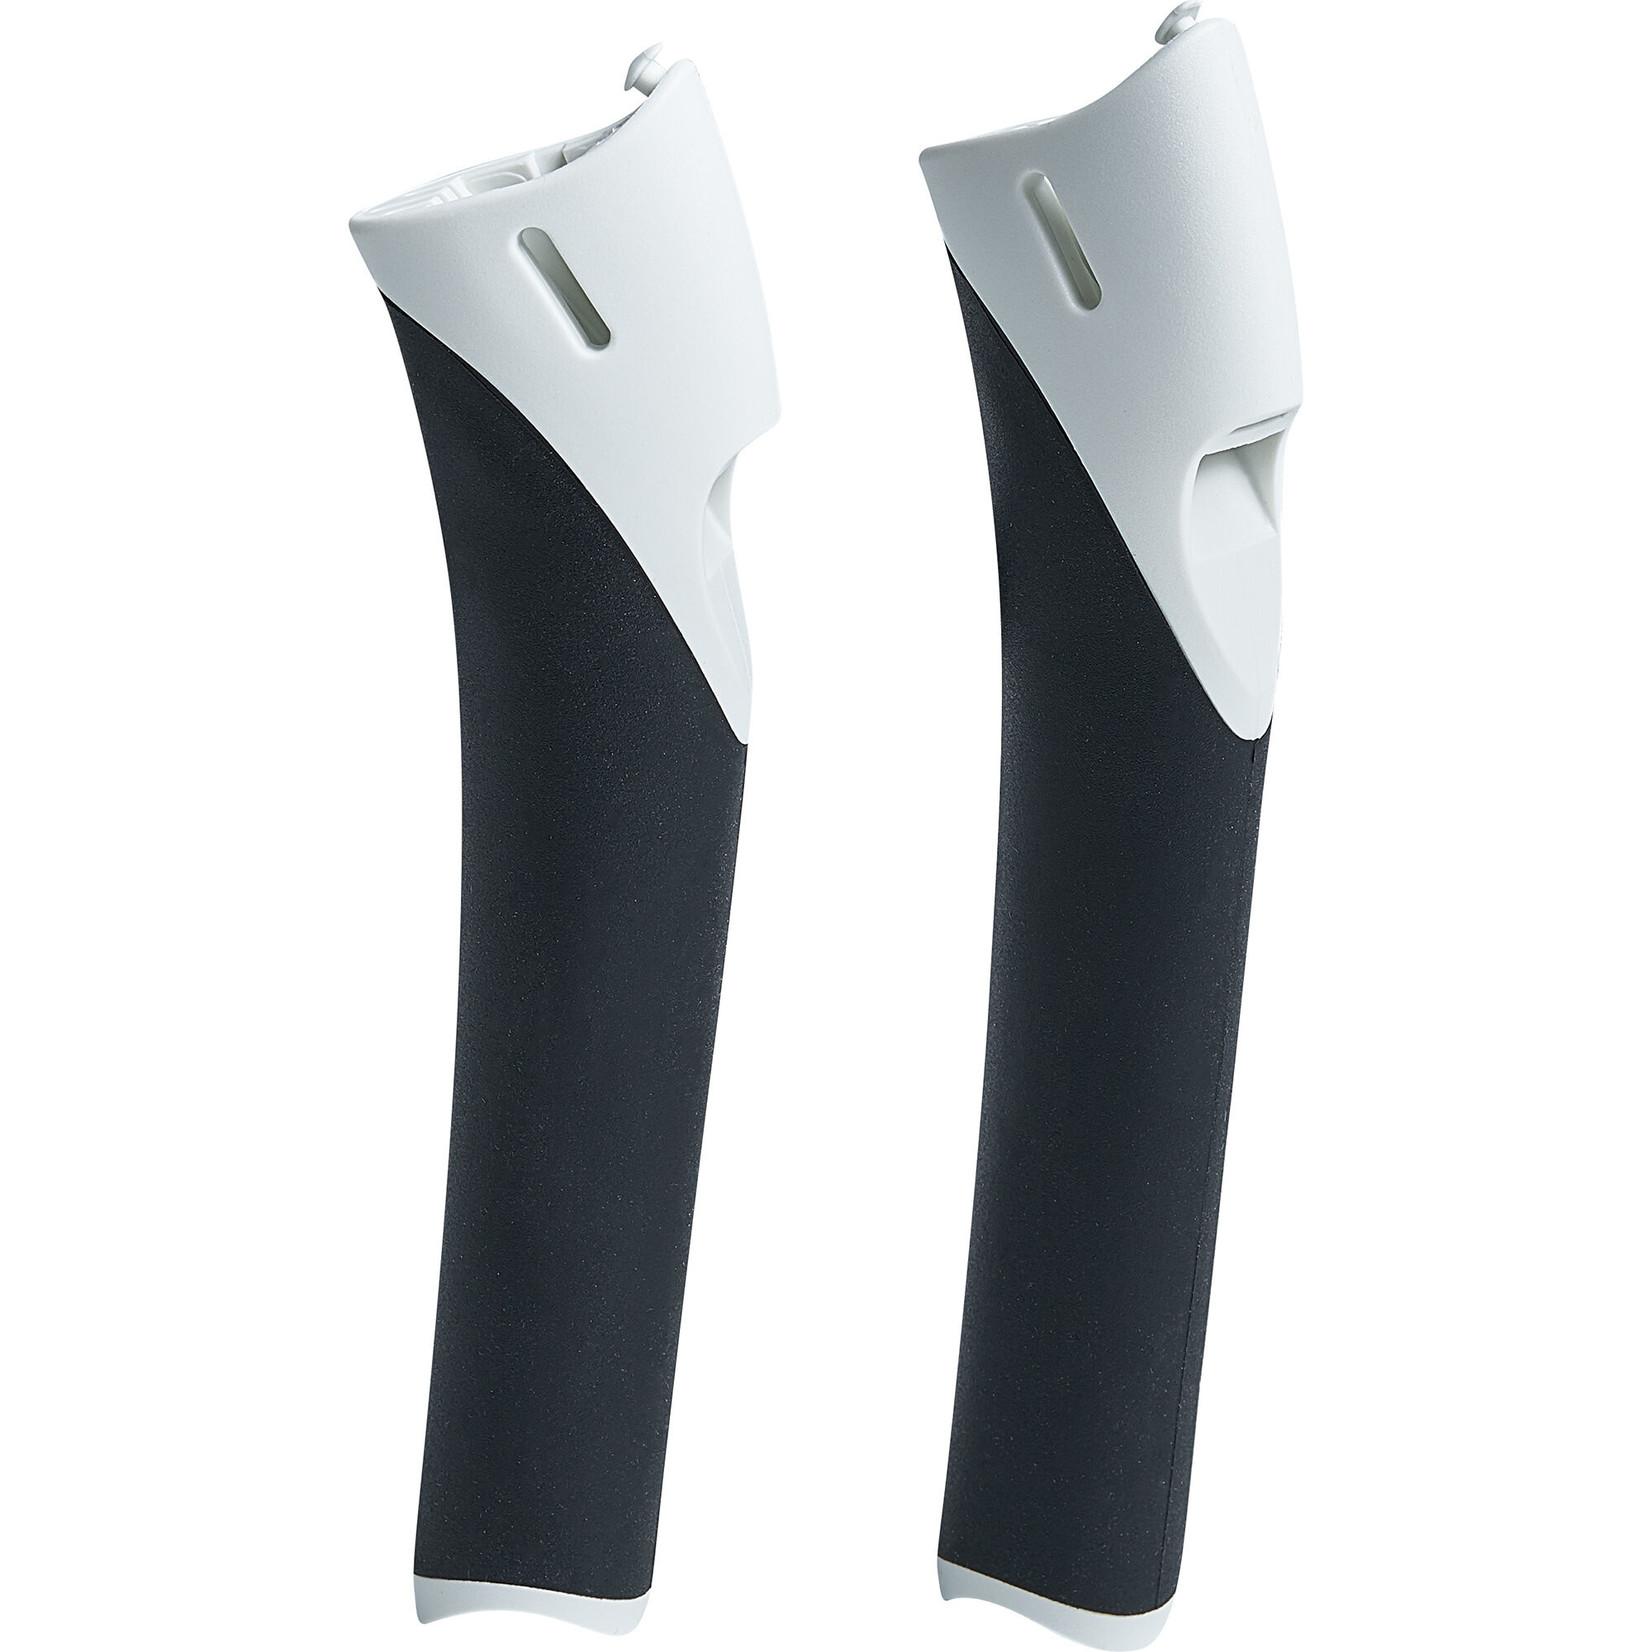 Swix Swix PC Urethane Pole Handles 16mm